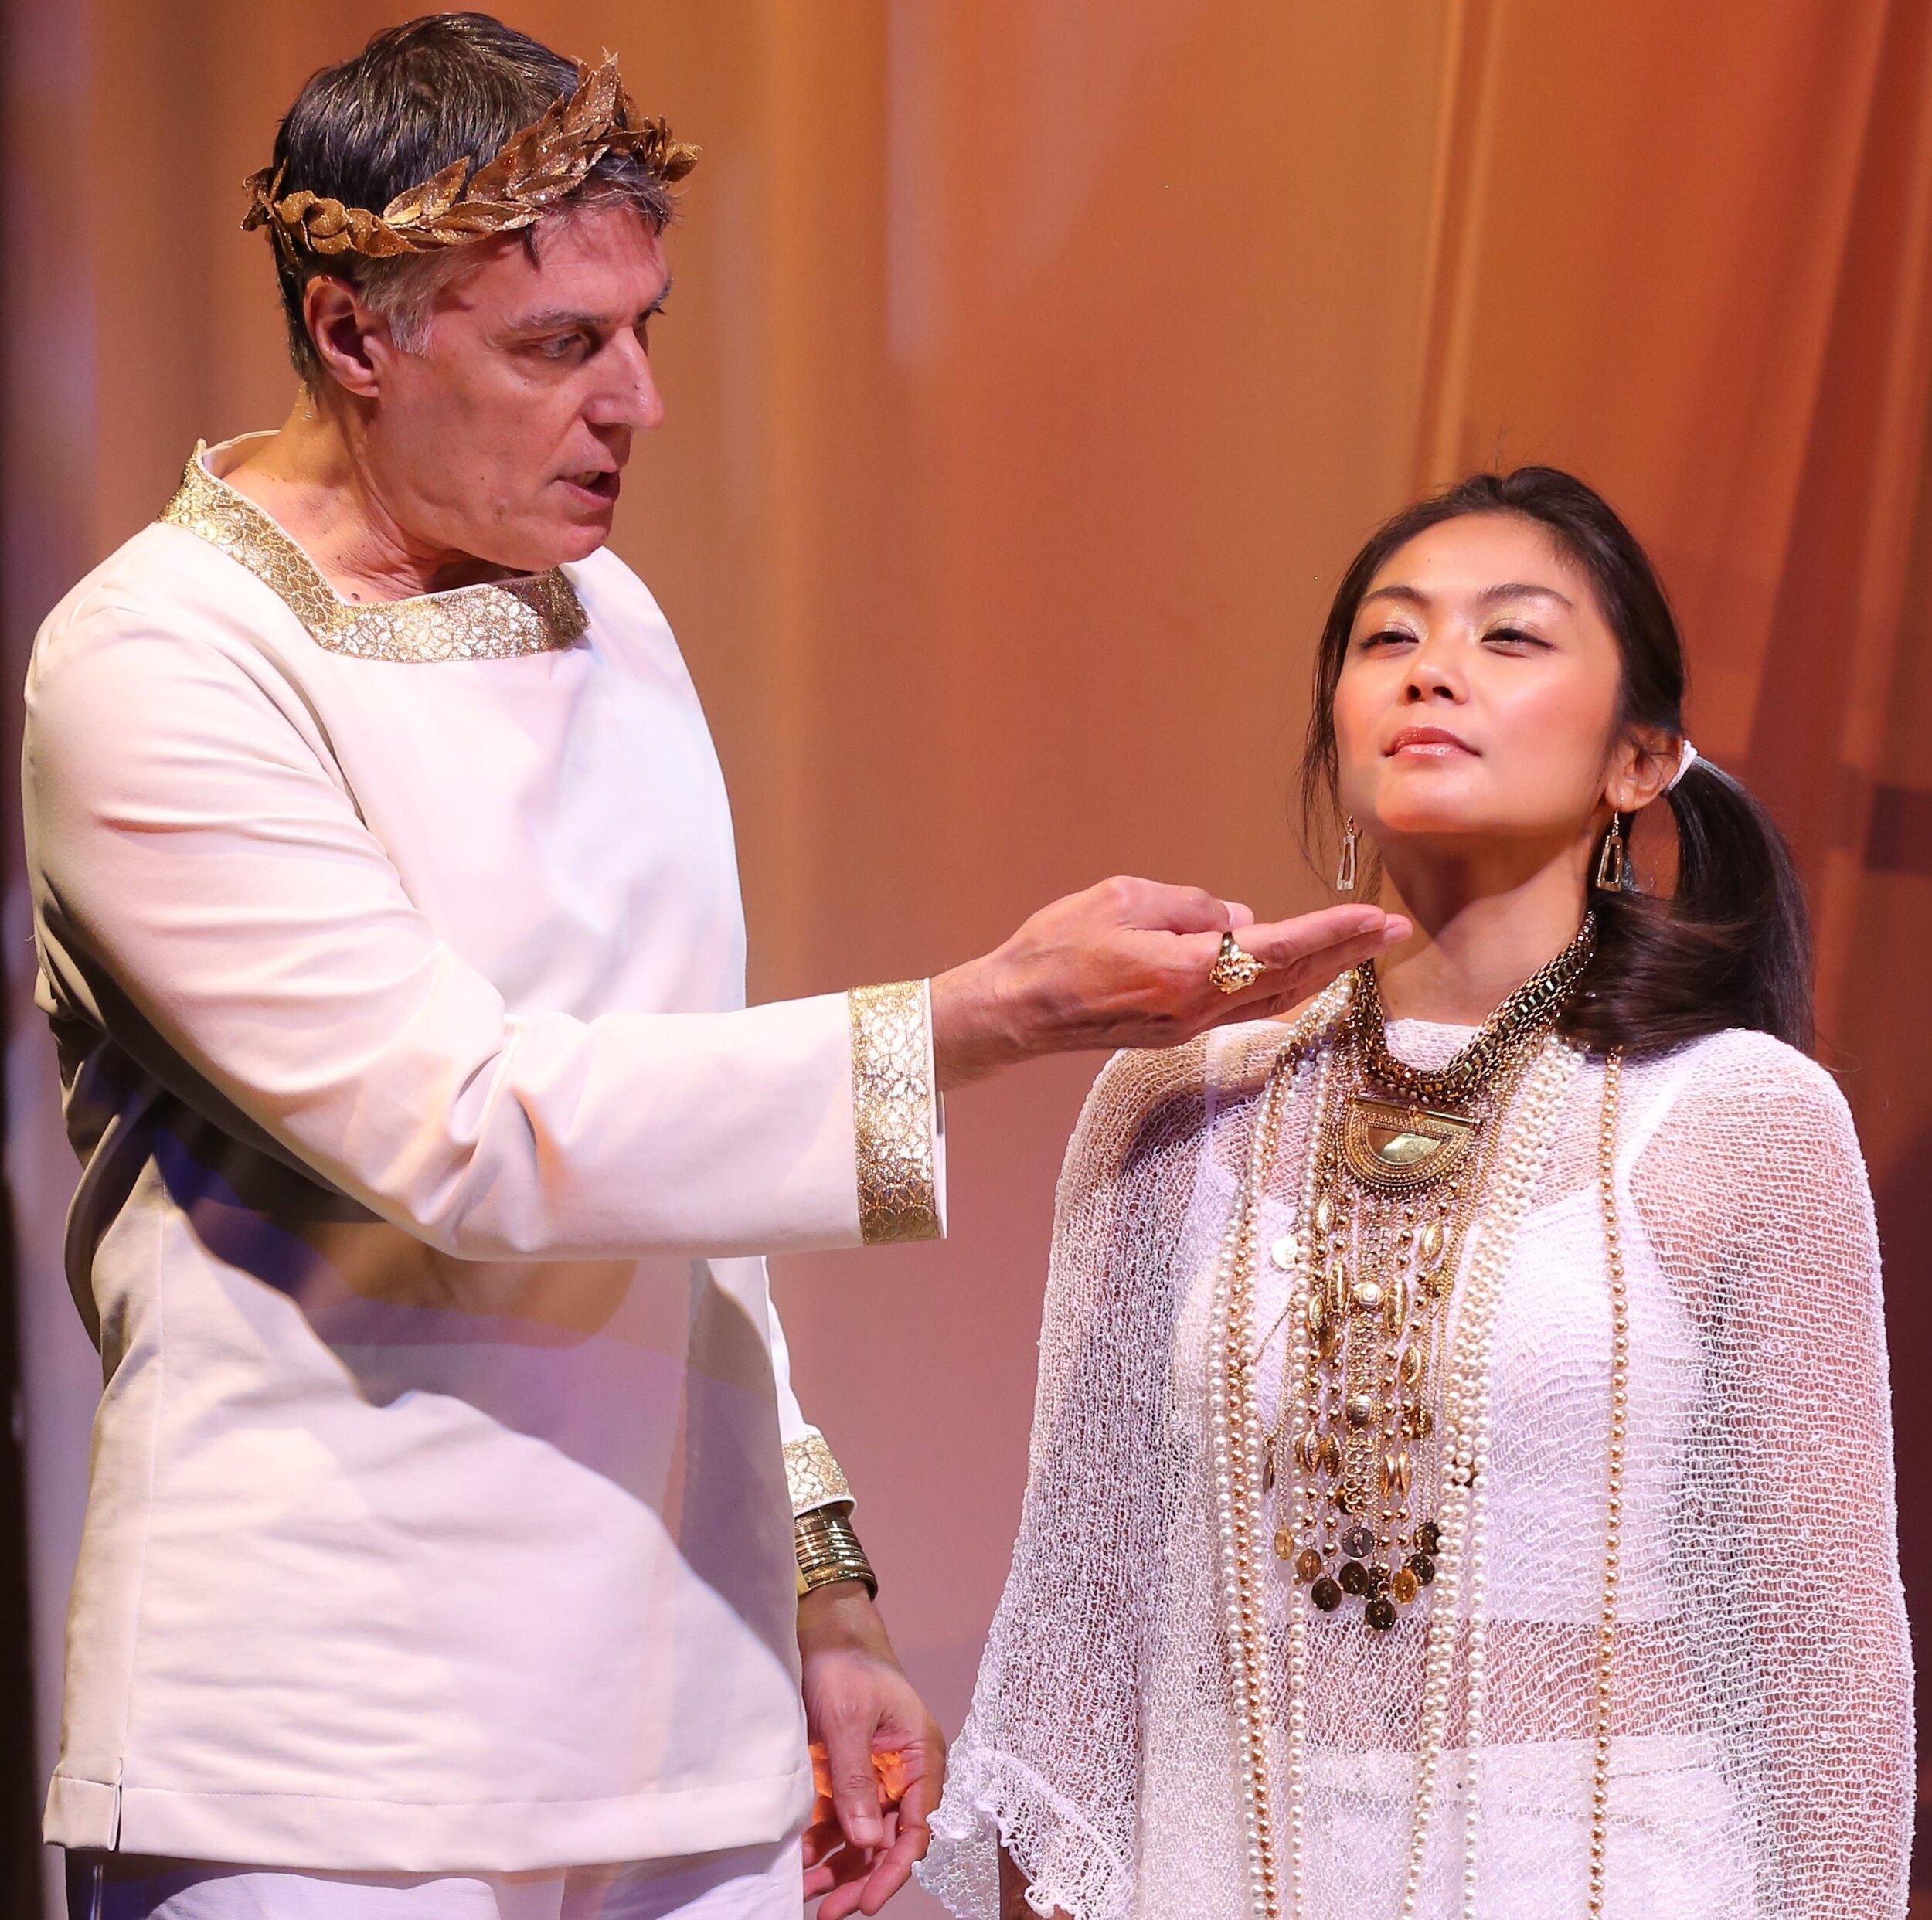 Robert Cuccioli plays Julius Caesar and Teresa Avia Lim is Cleopatra in George Bernard Shaw's  Caesar and Cleopatra.  Photographs by Carol Rosegg.